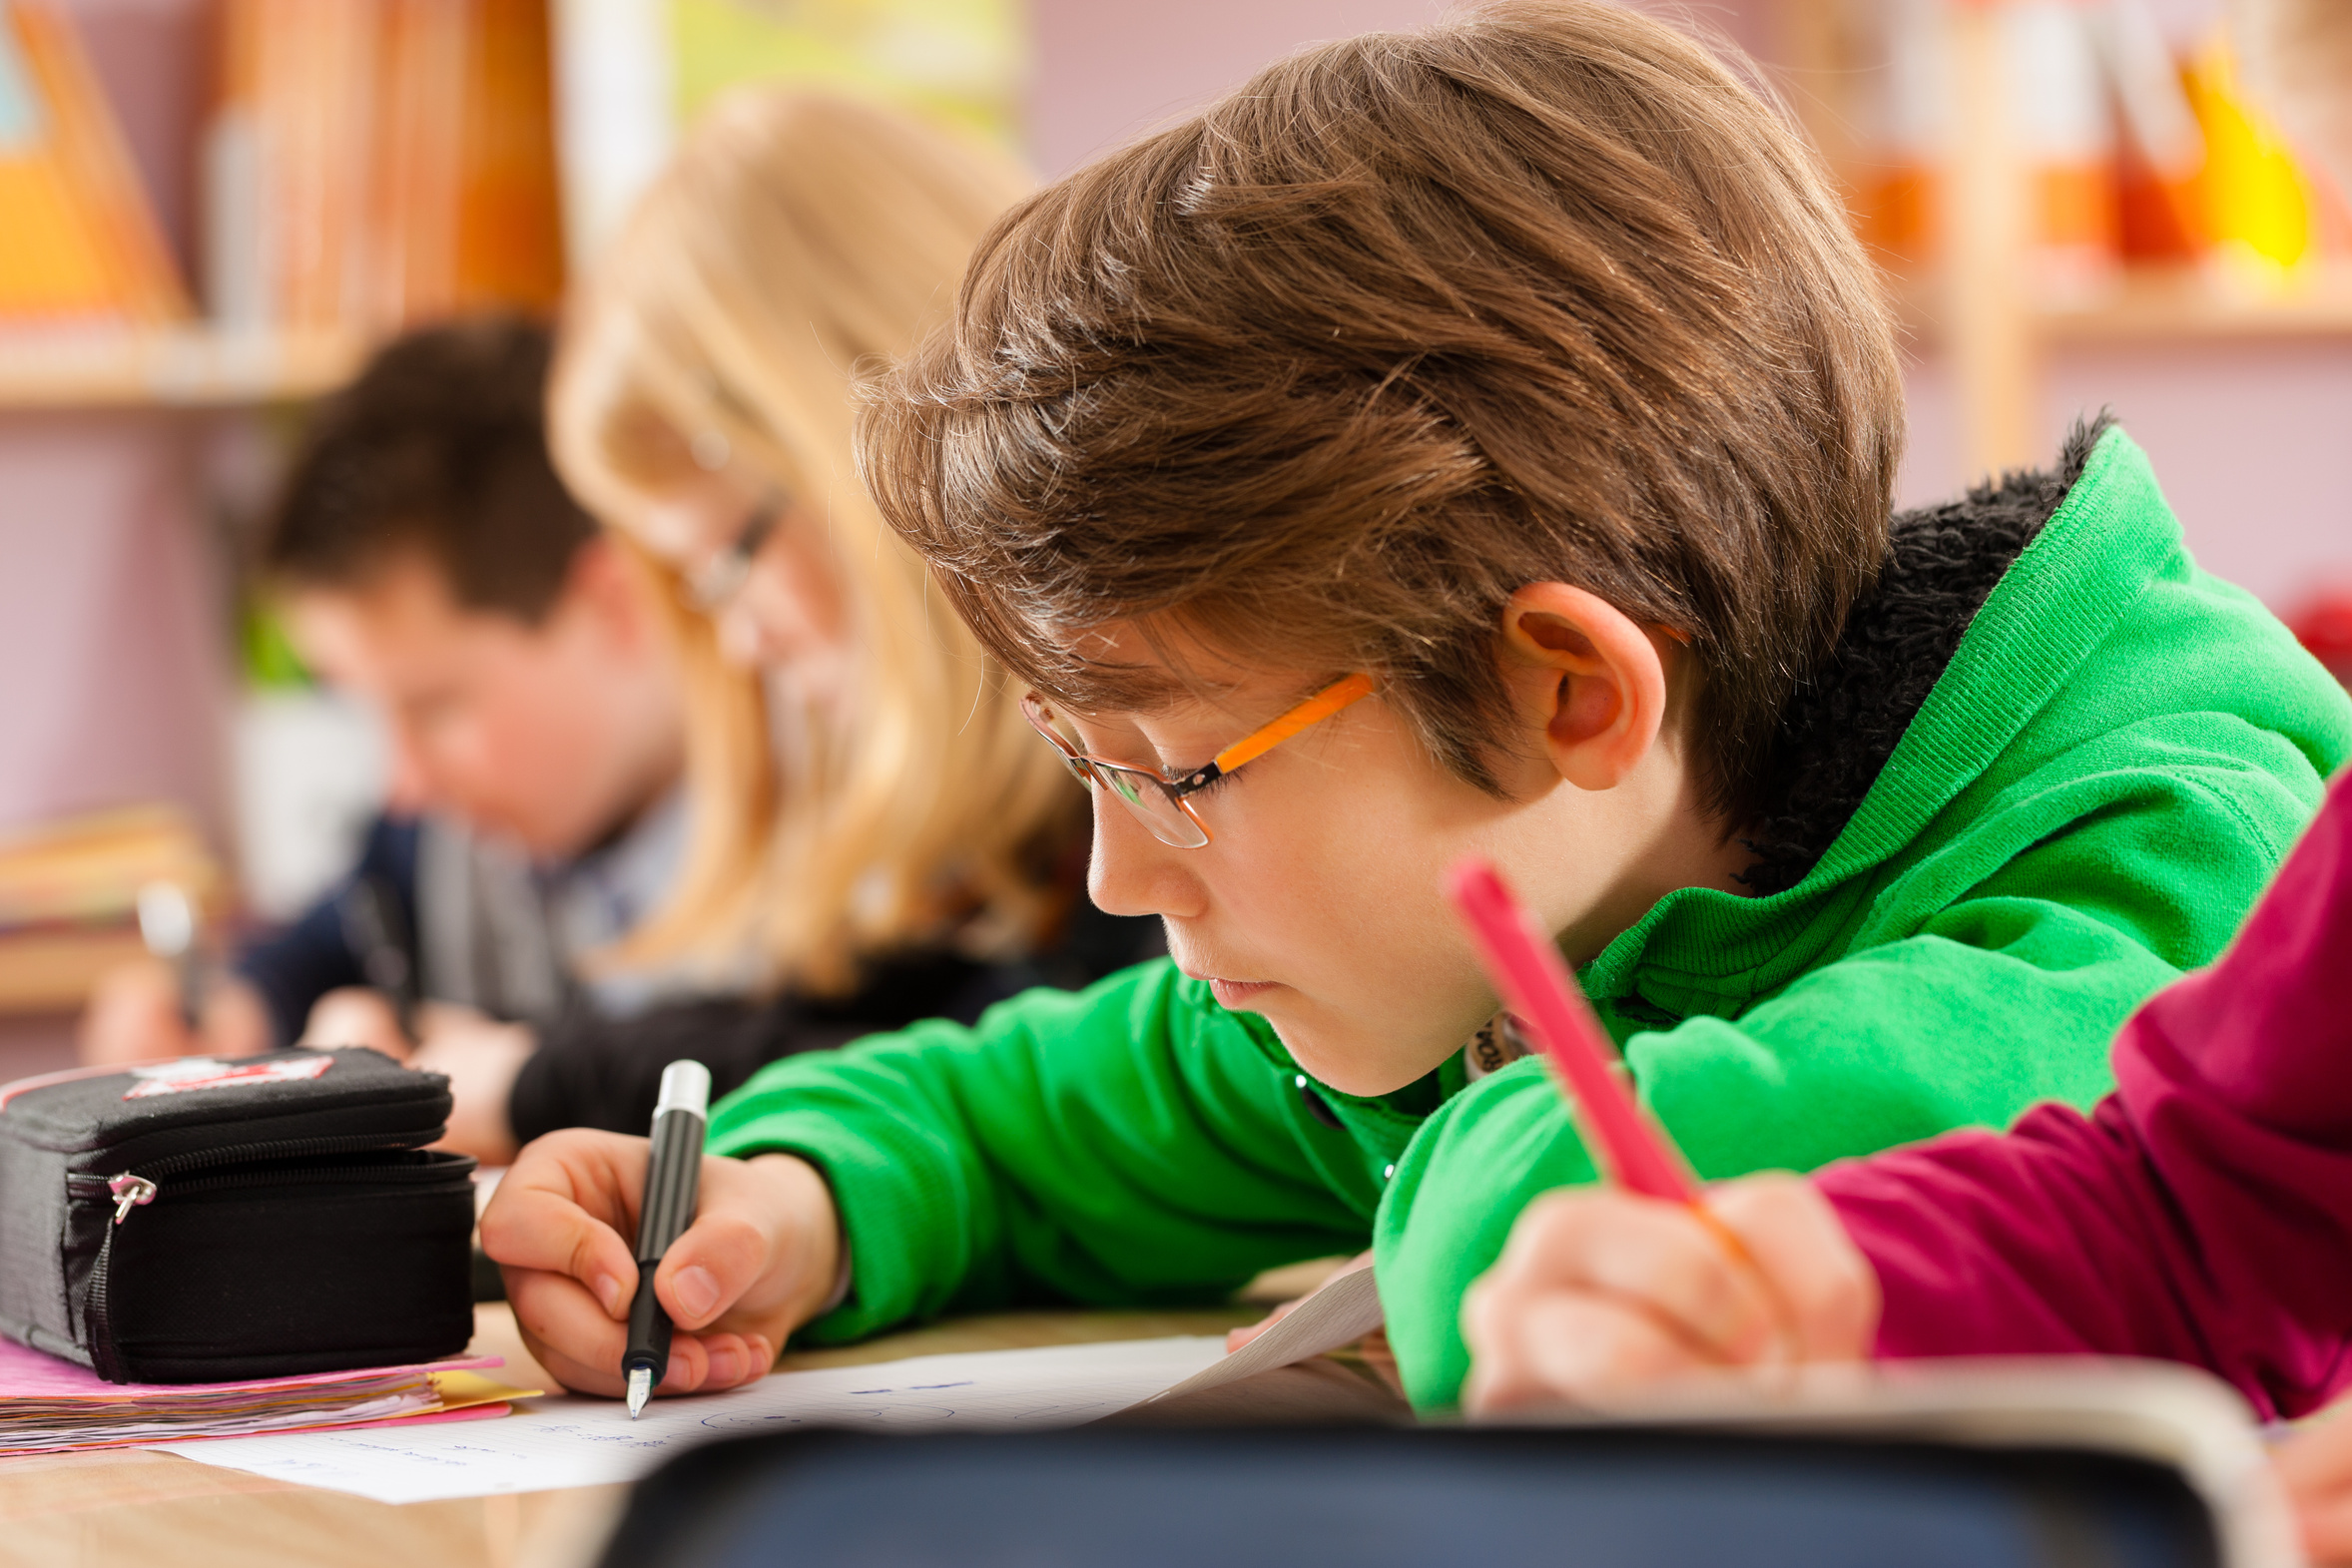 Pupils at school doing their homework